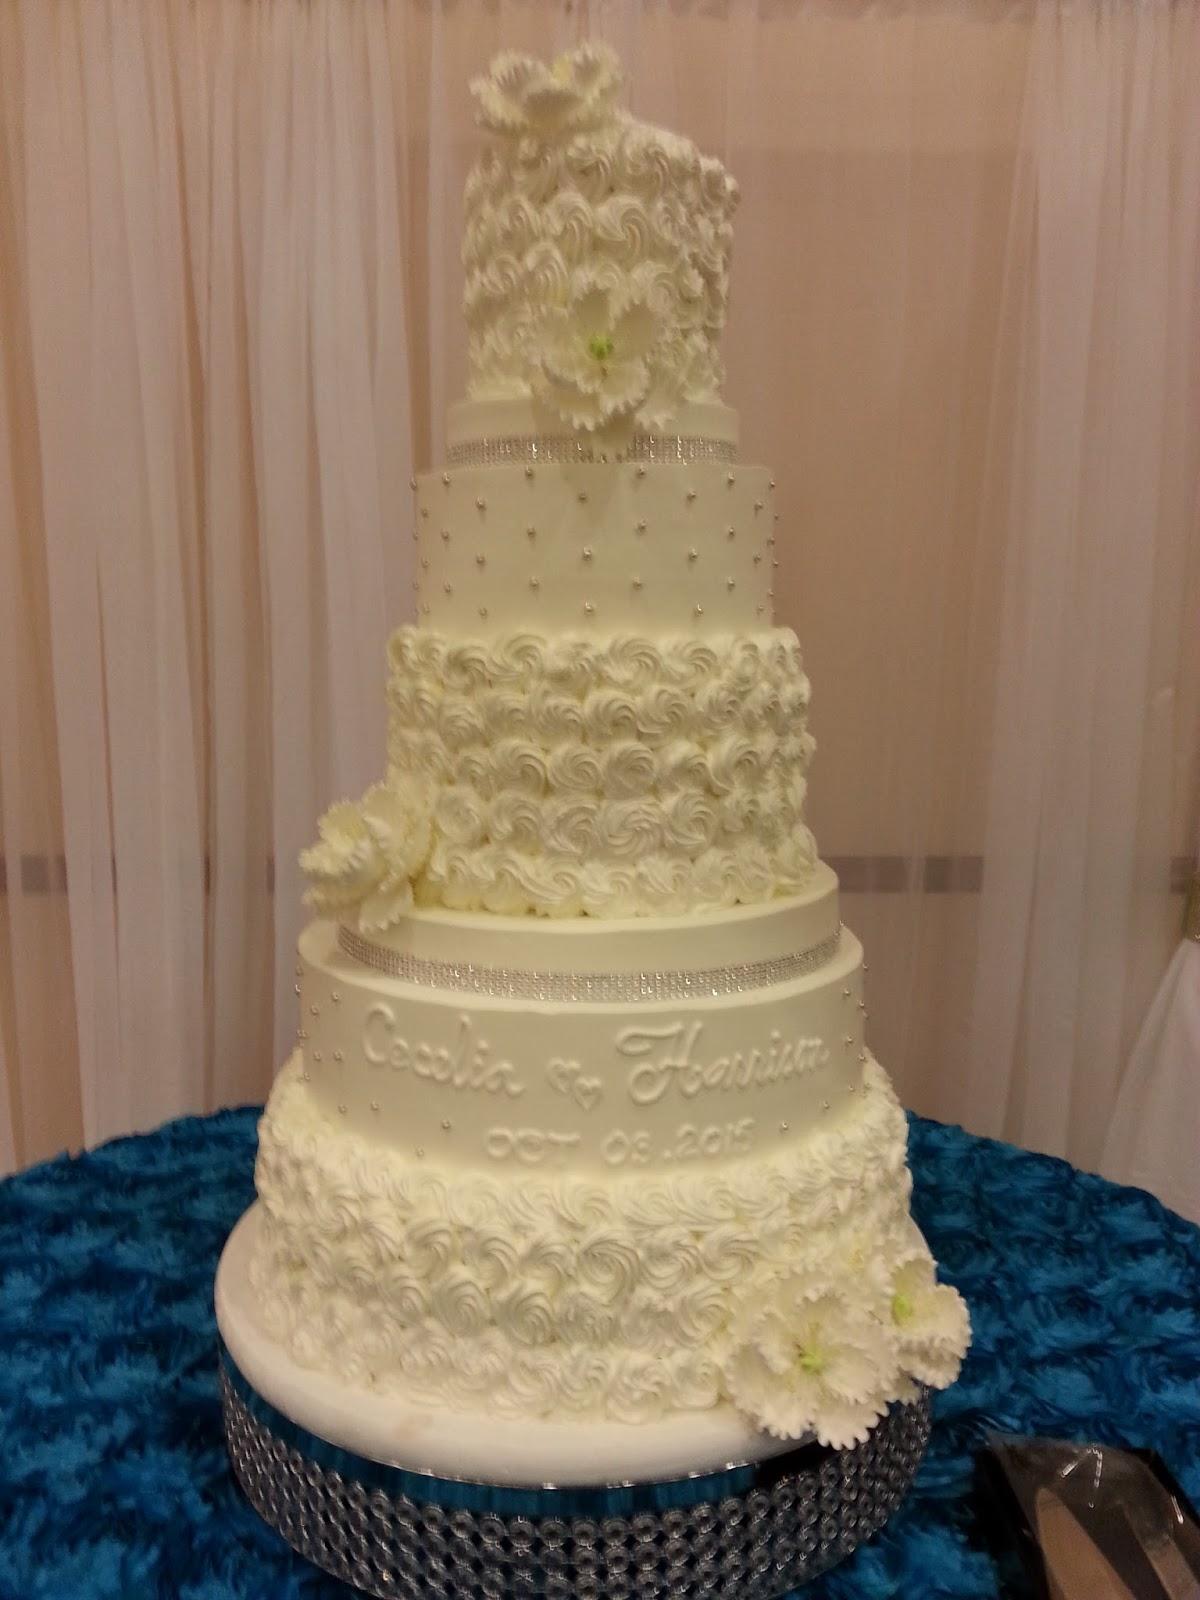 Bamboo Bakery 6022468061 Cake Tasting Menu for November 5th